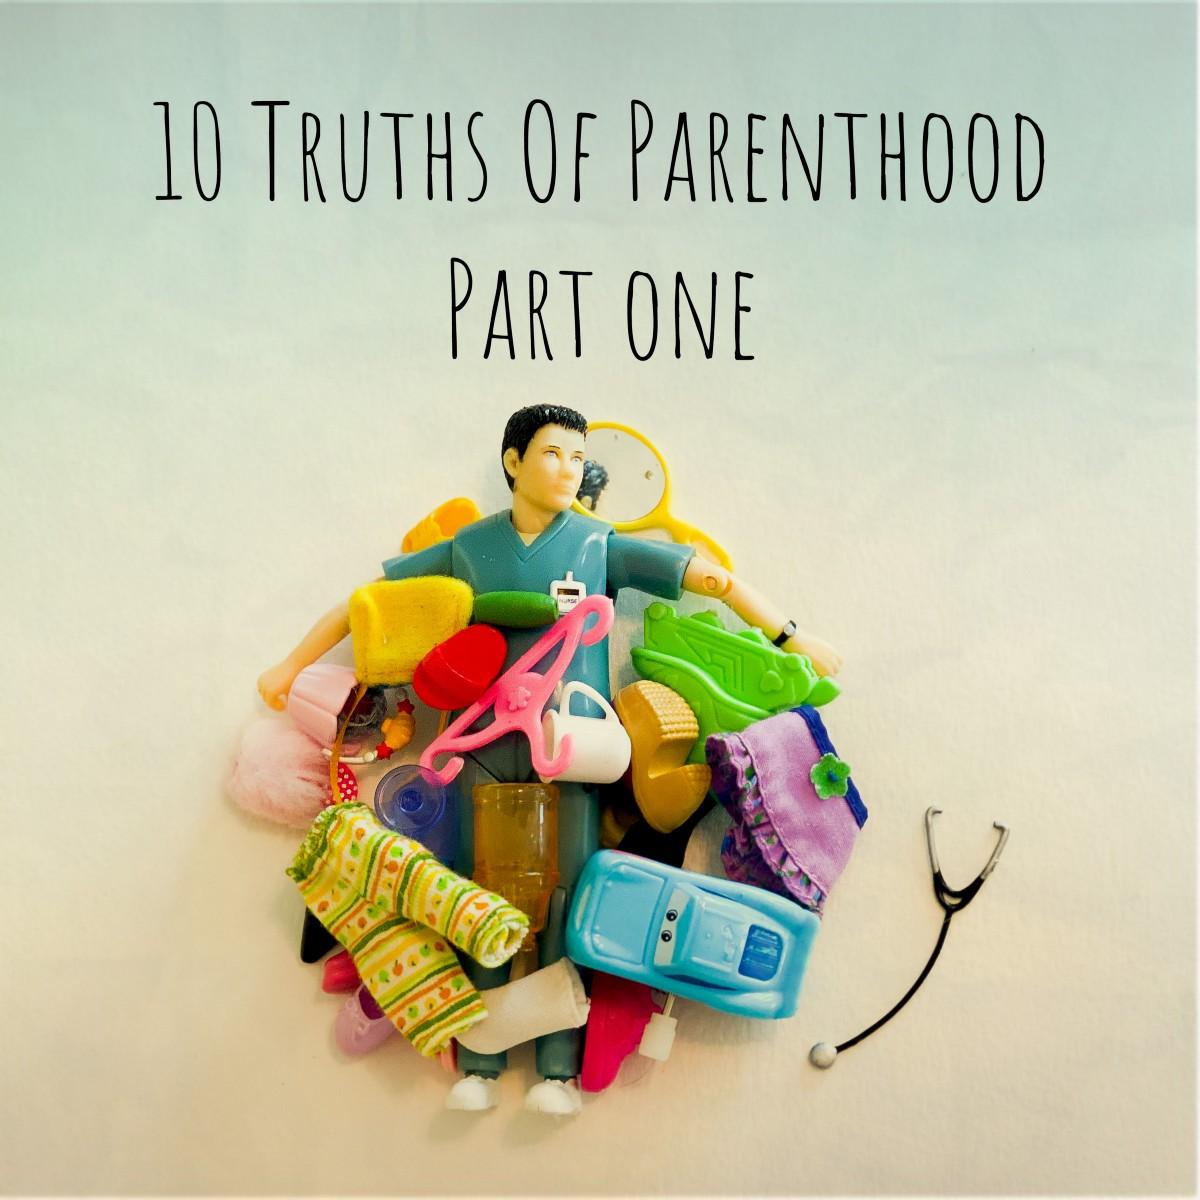 10 Truths Of Parenthood—Part One